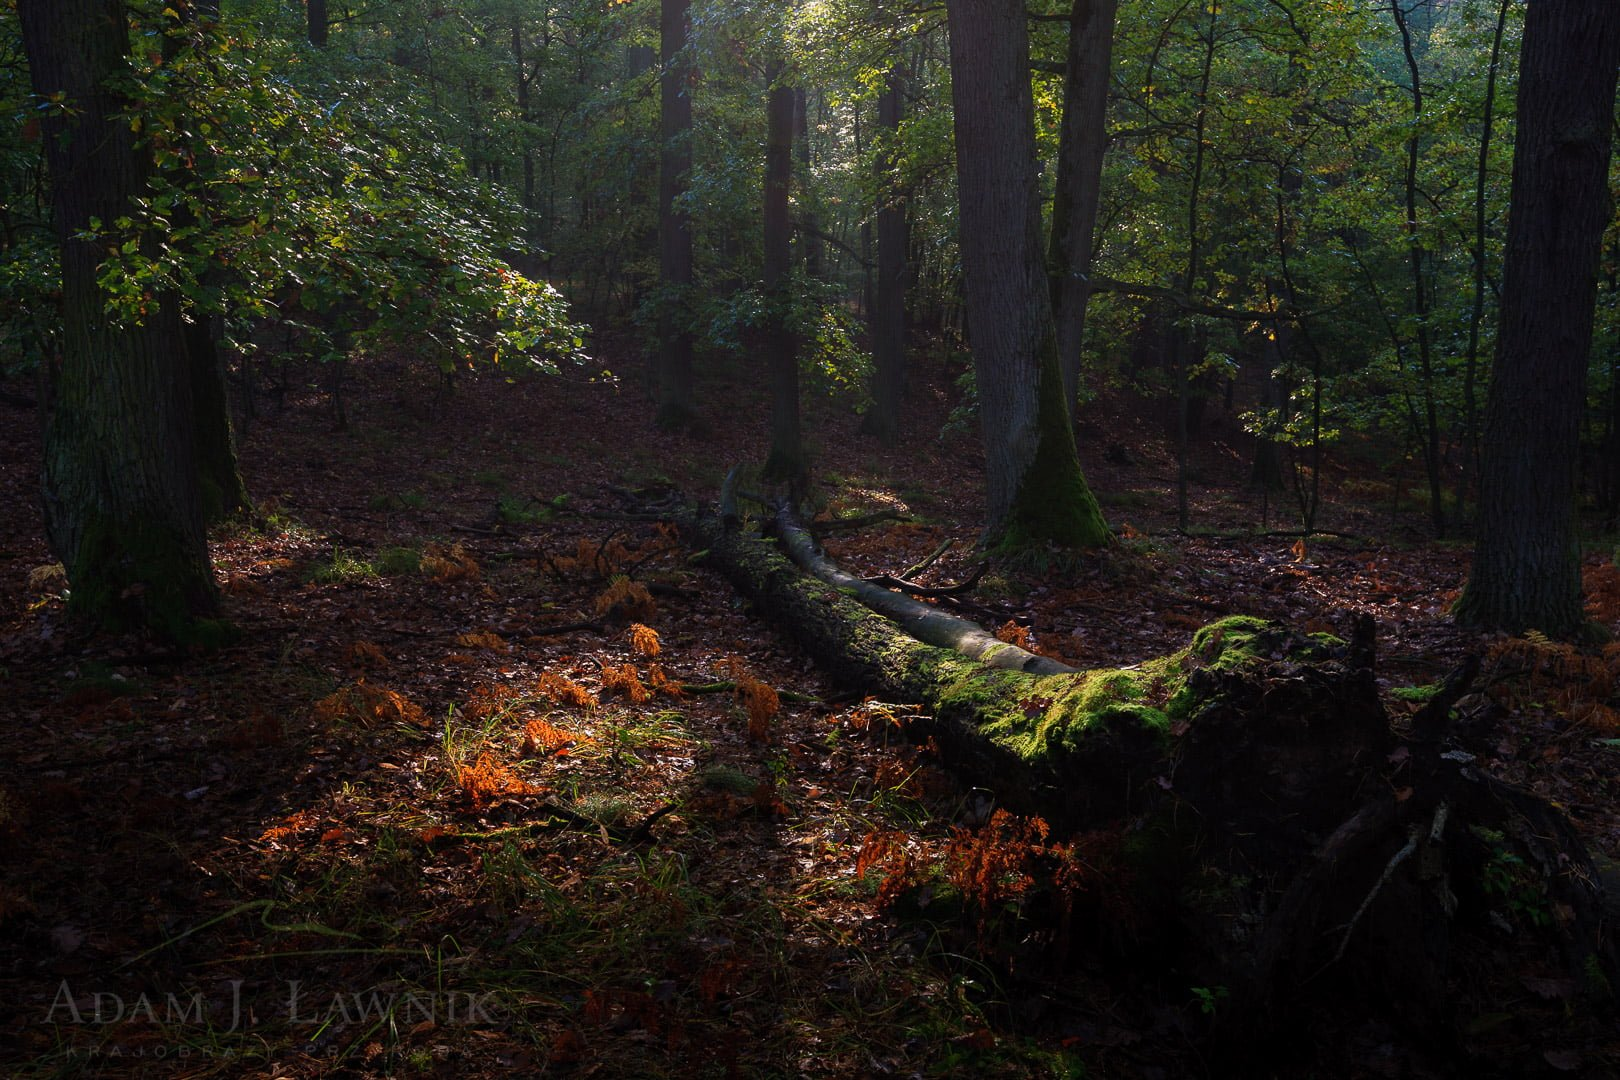 Wielkopolska National Park, Poland 1110-02107C